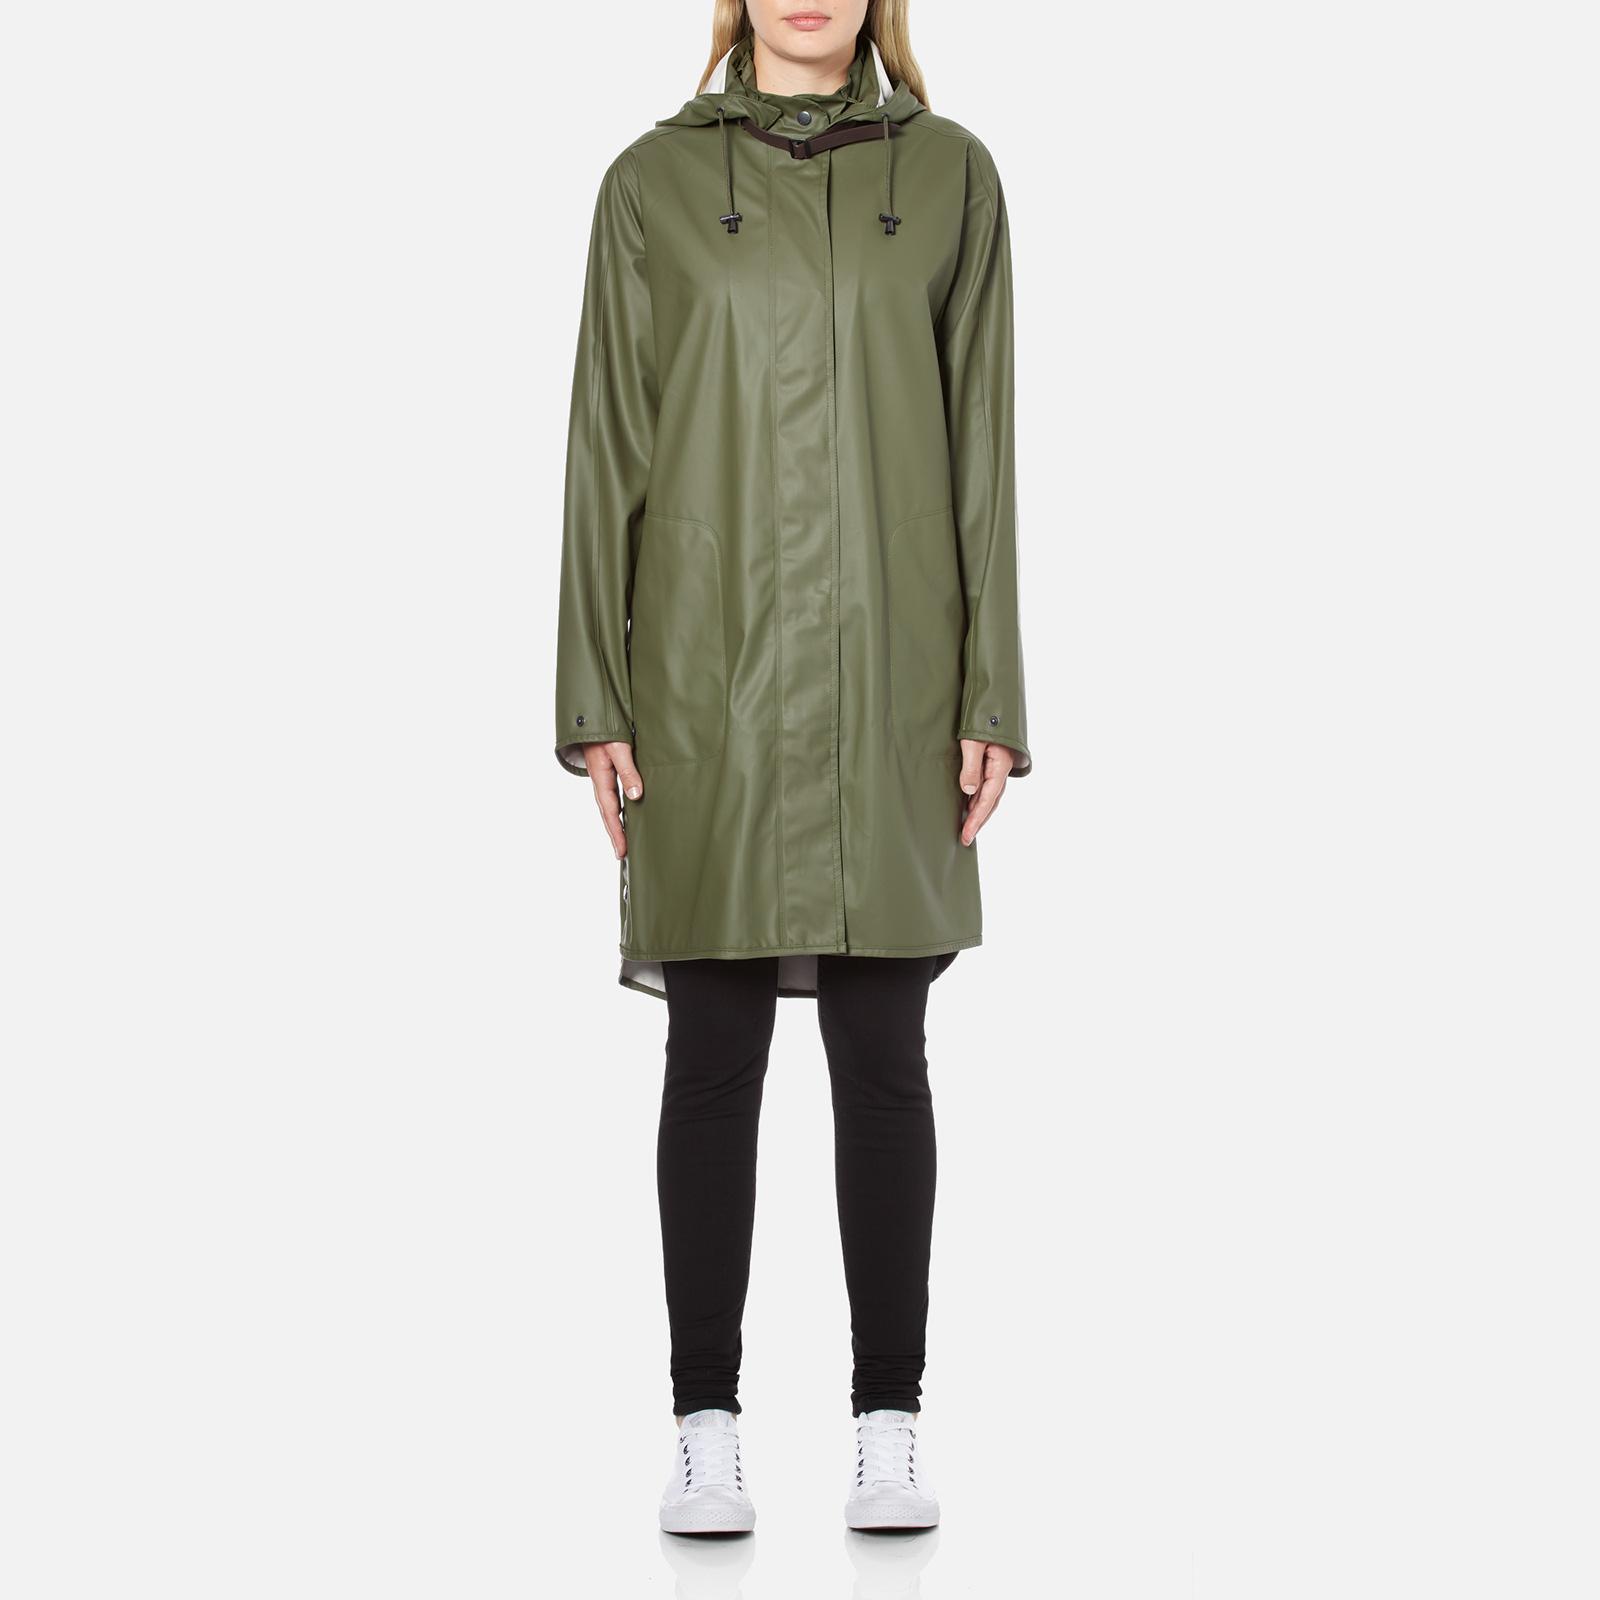 eef413c656f1 Ilse Jacobsen Women s Light True Rain A Line Coat - Army Womens Clothing